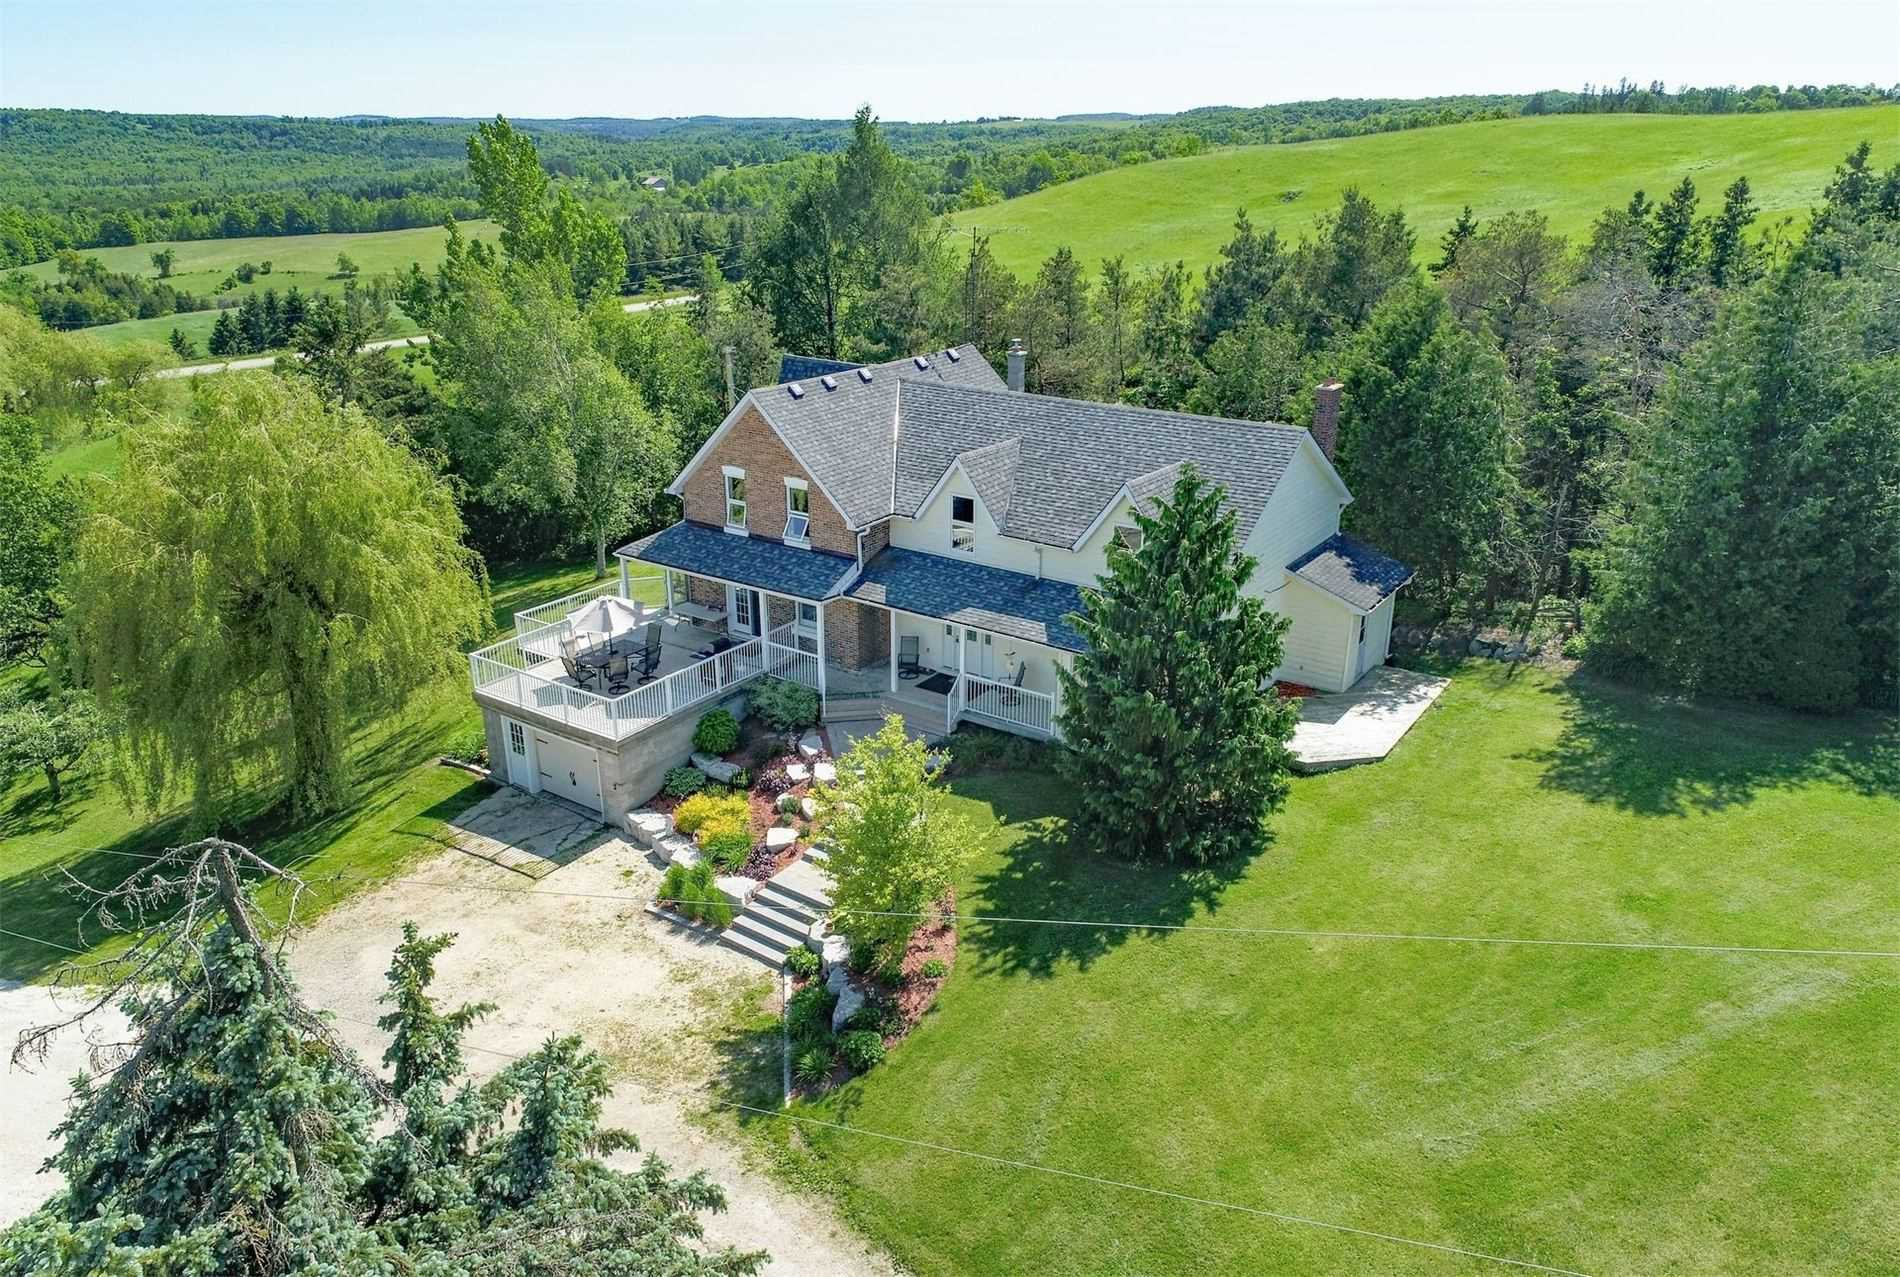 Main Photo: 587499 10 Sideroad in Mulmur: Rural Mulmur House (2-Storey) for sale : MLS®# X4818749